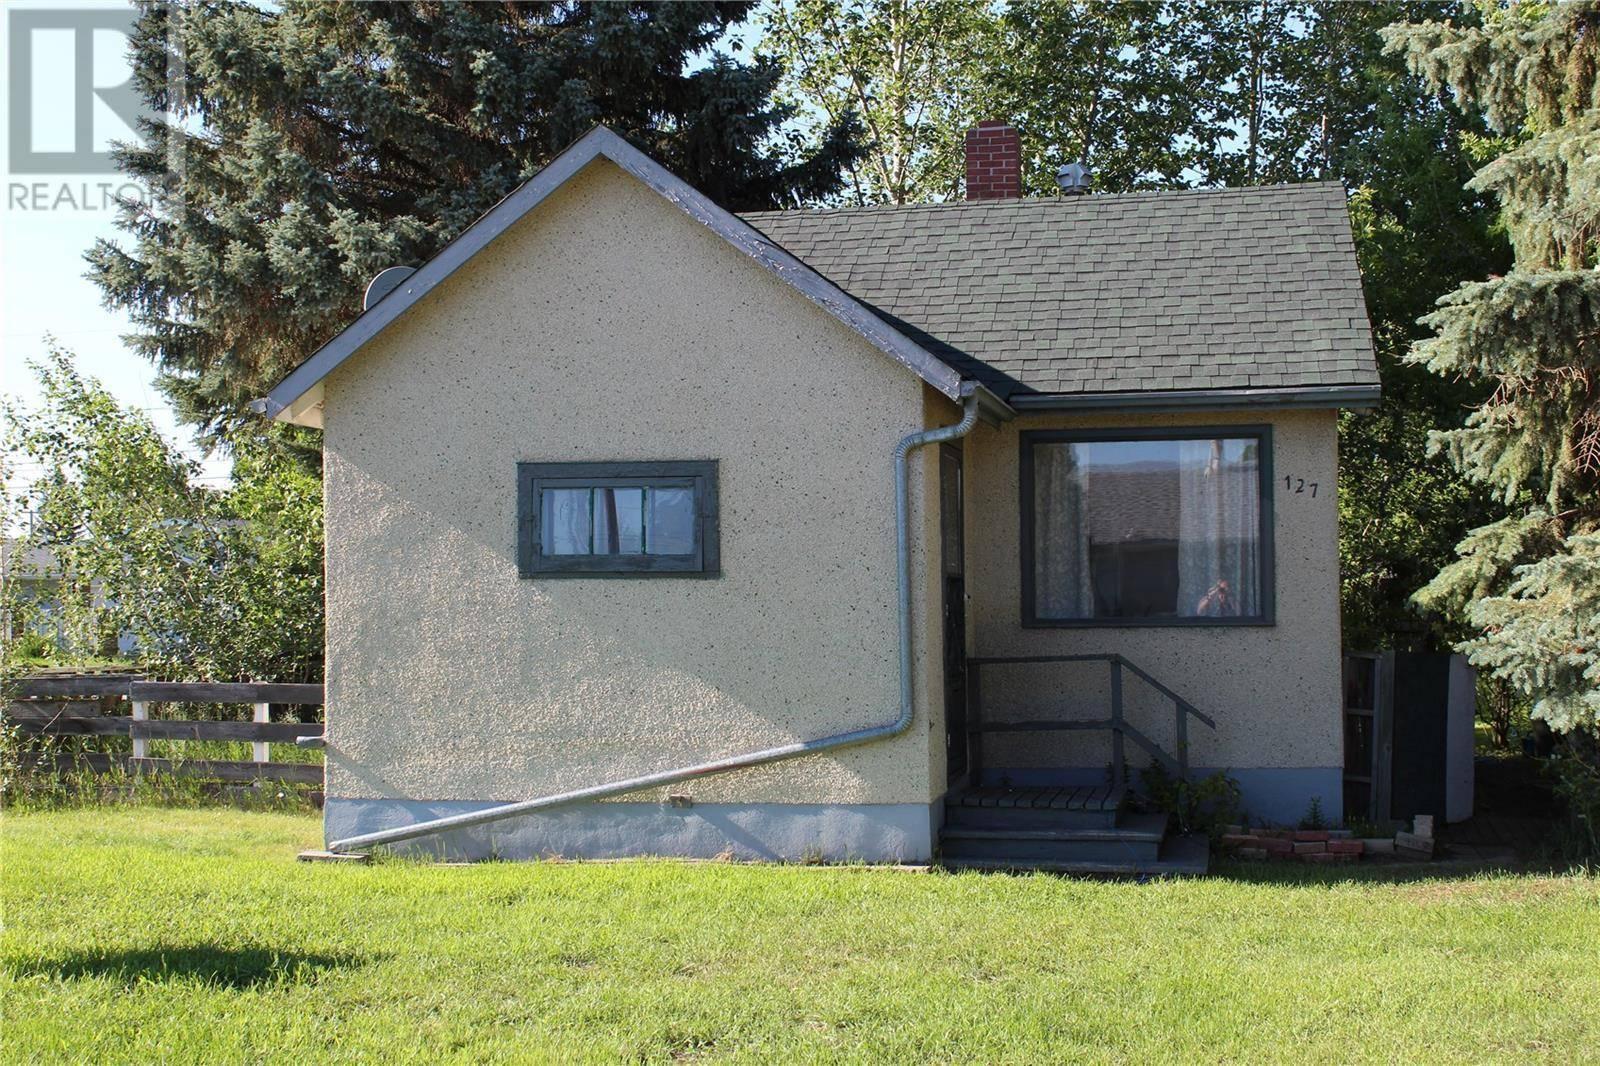 House for sale at 127 1st St W Langham Saskatchewan - MLS: SK764542